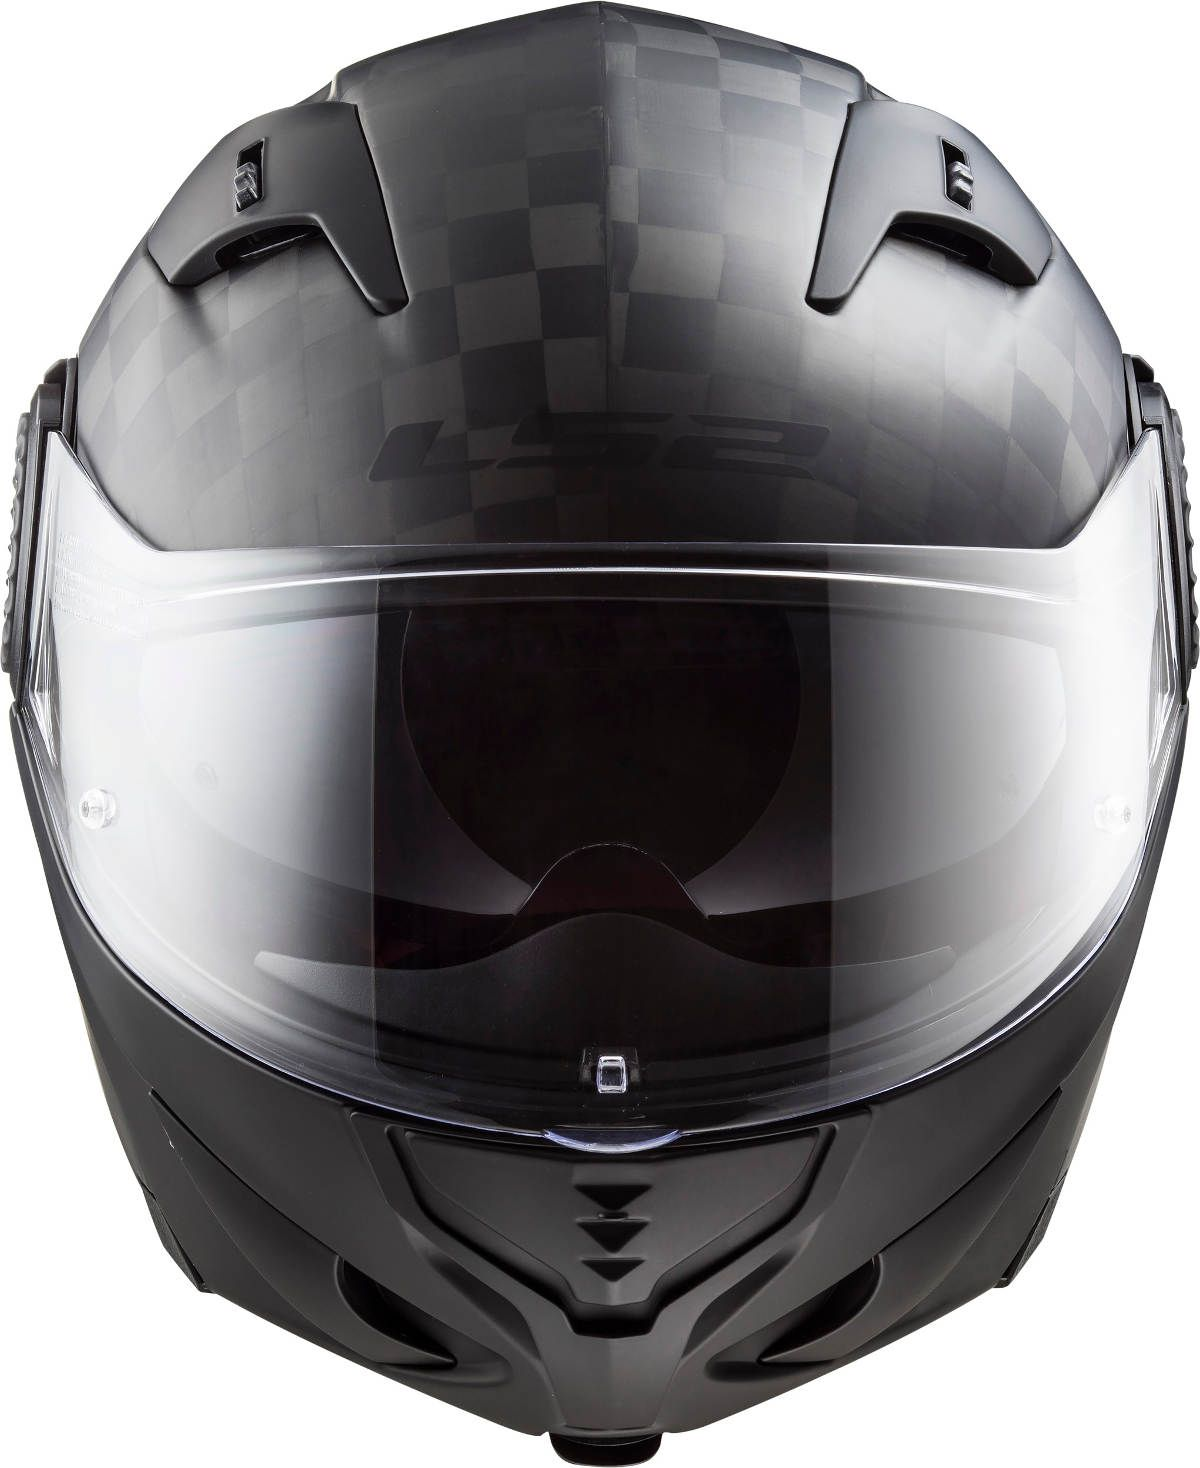 22c08166 New LS2 Vortex Carbon Fibre Modular Motorcycle Helmet | Bikes ...